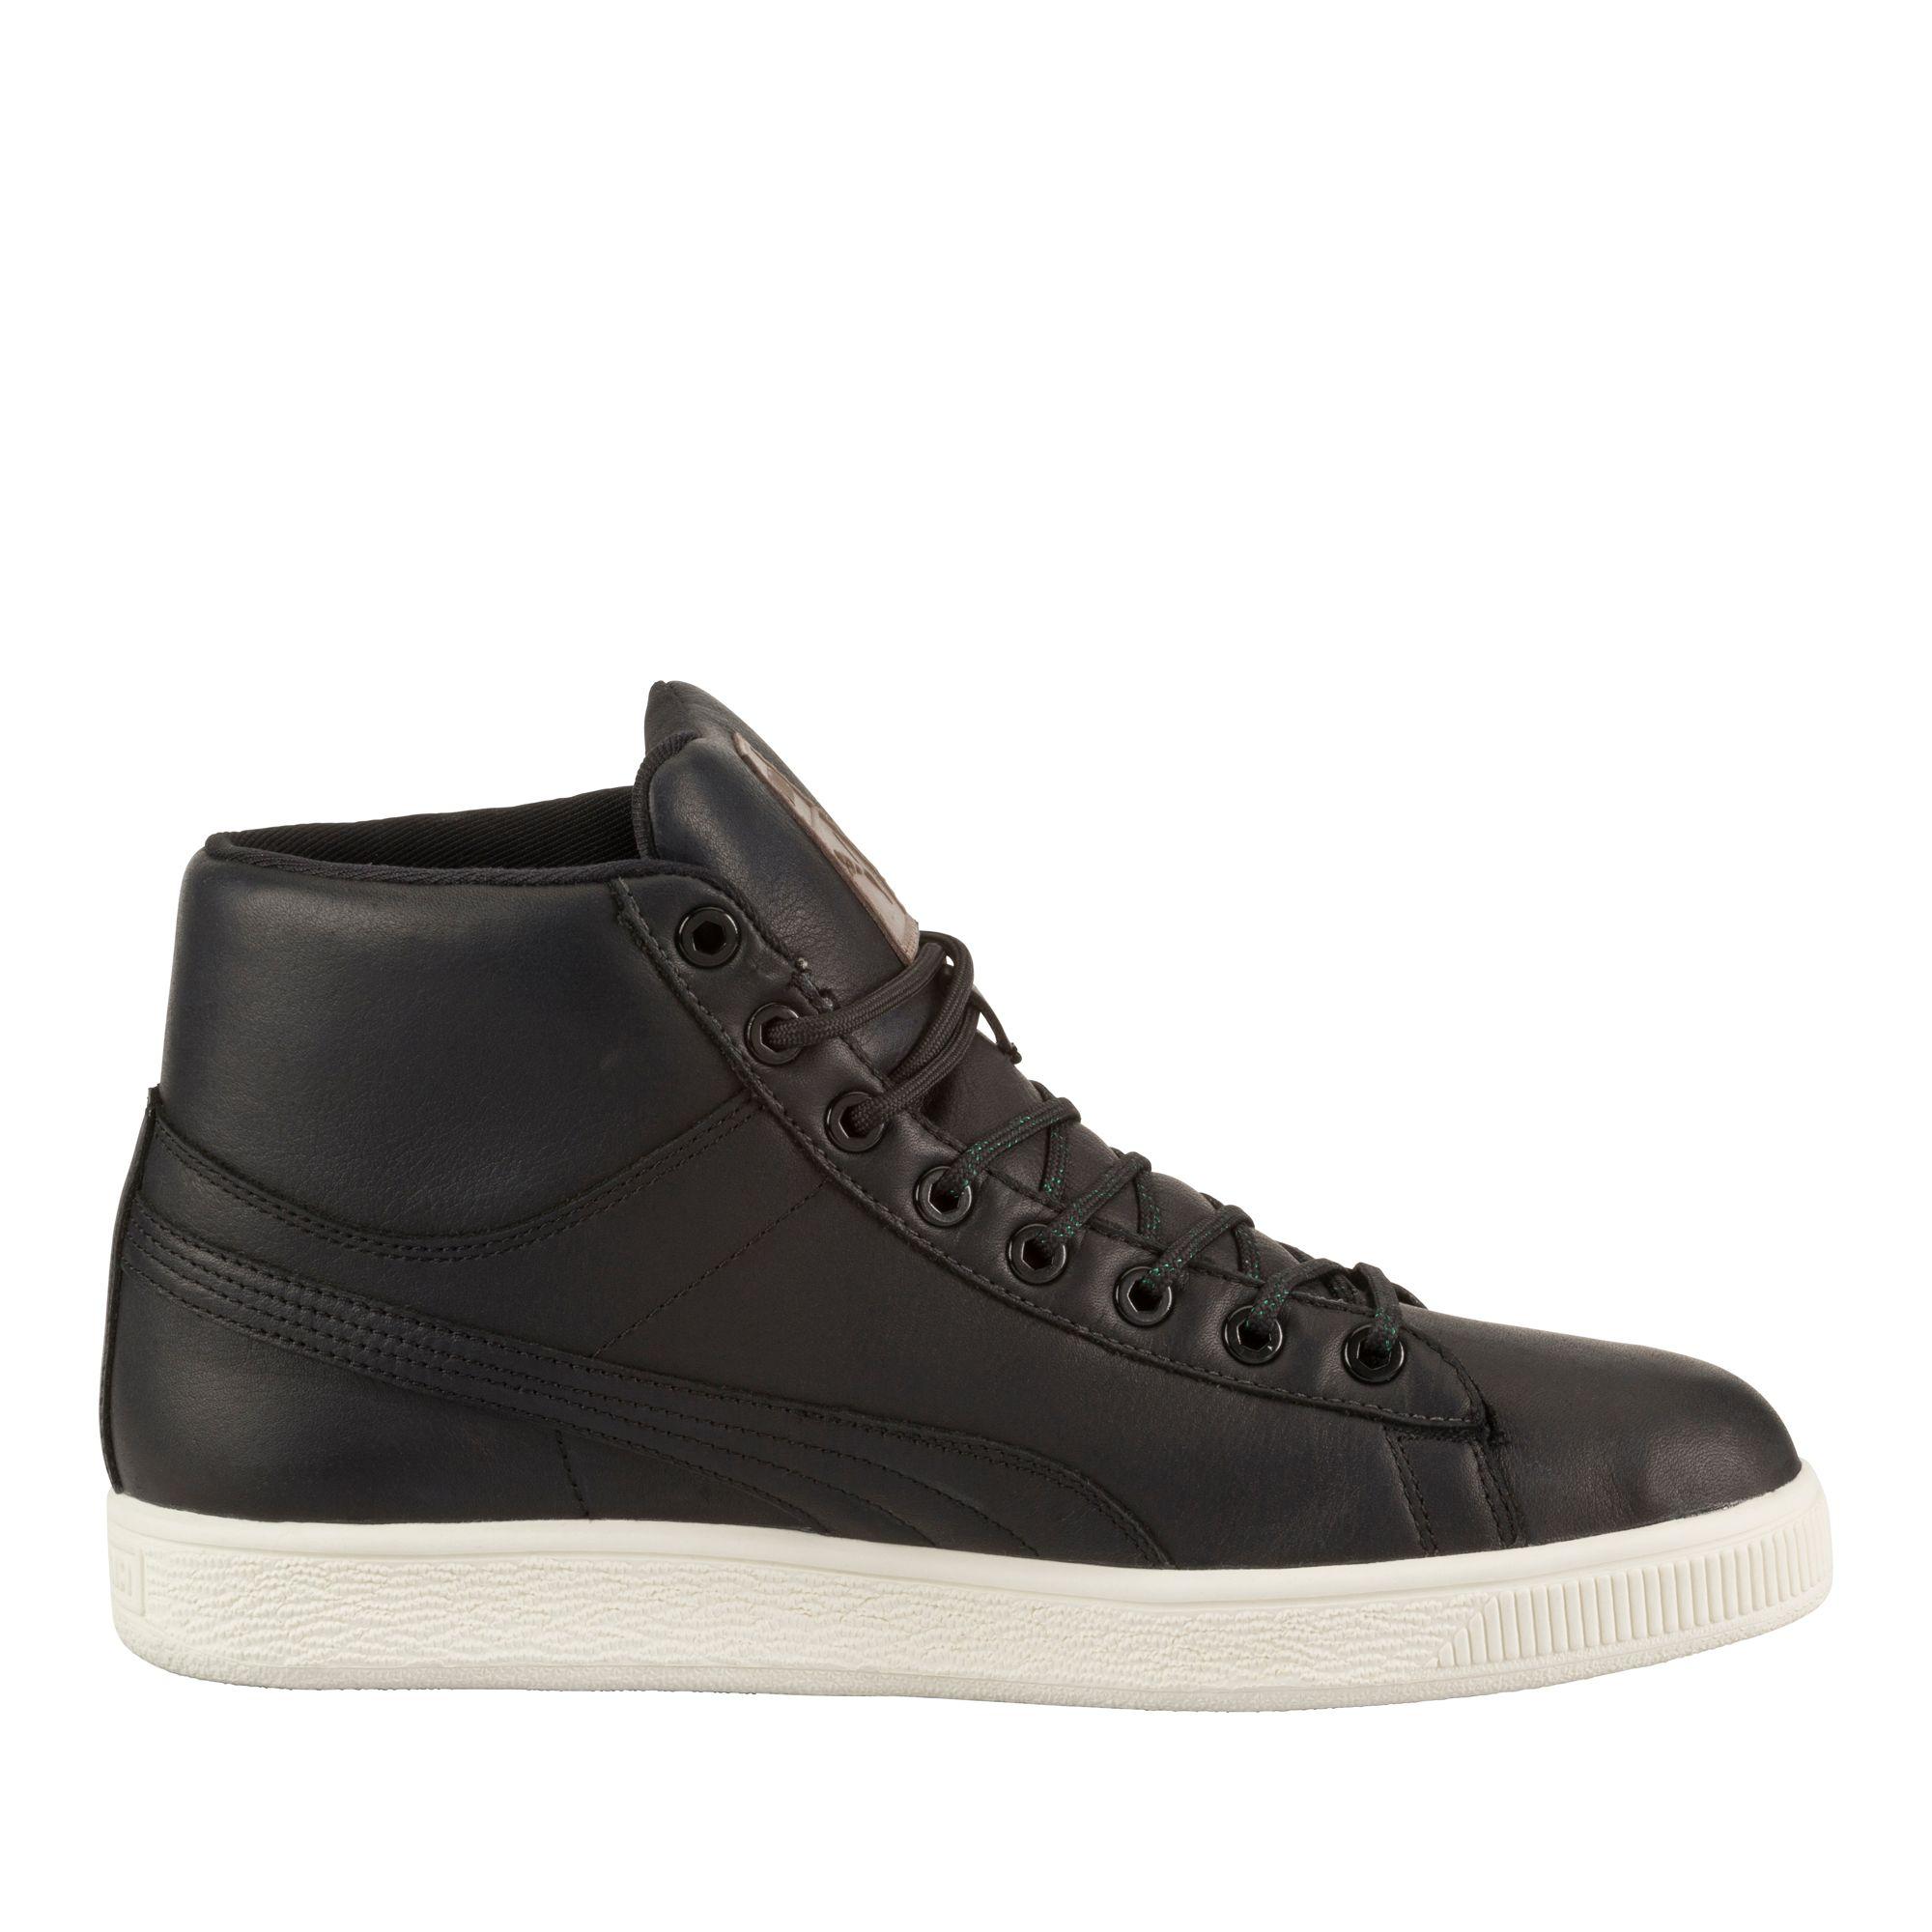 8f866a9bb514 PUMA Basket Classic+ GTX® High Tops Footwear Sneakers Sport Classics ...